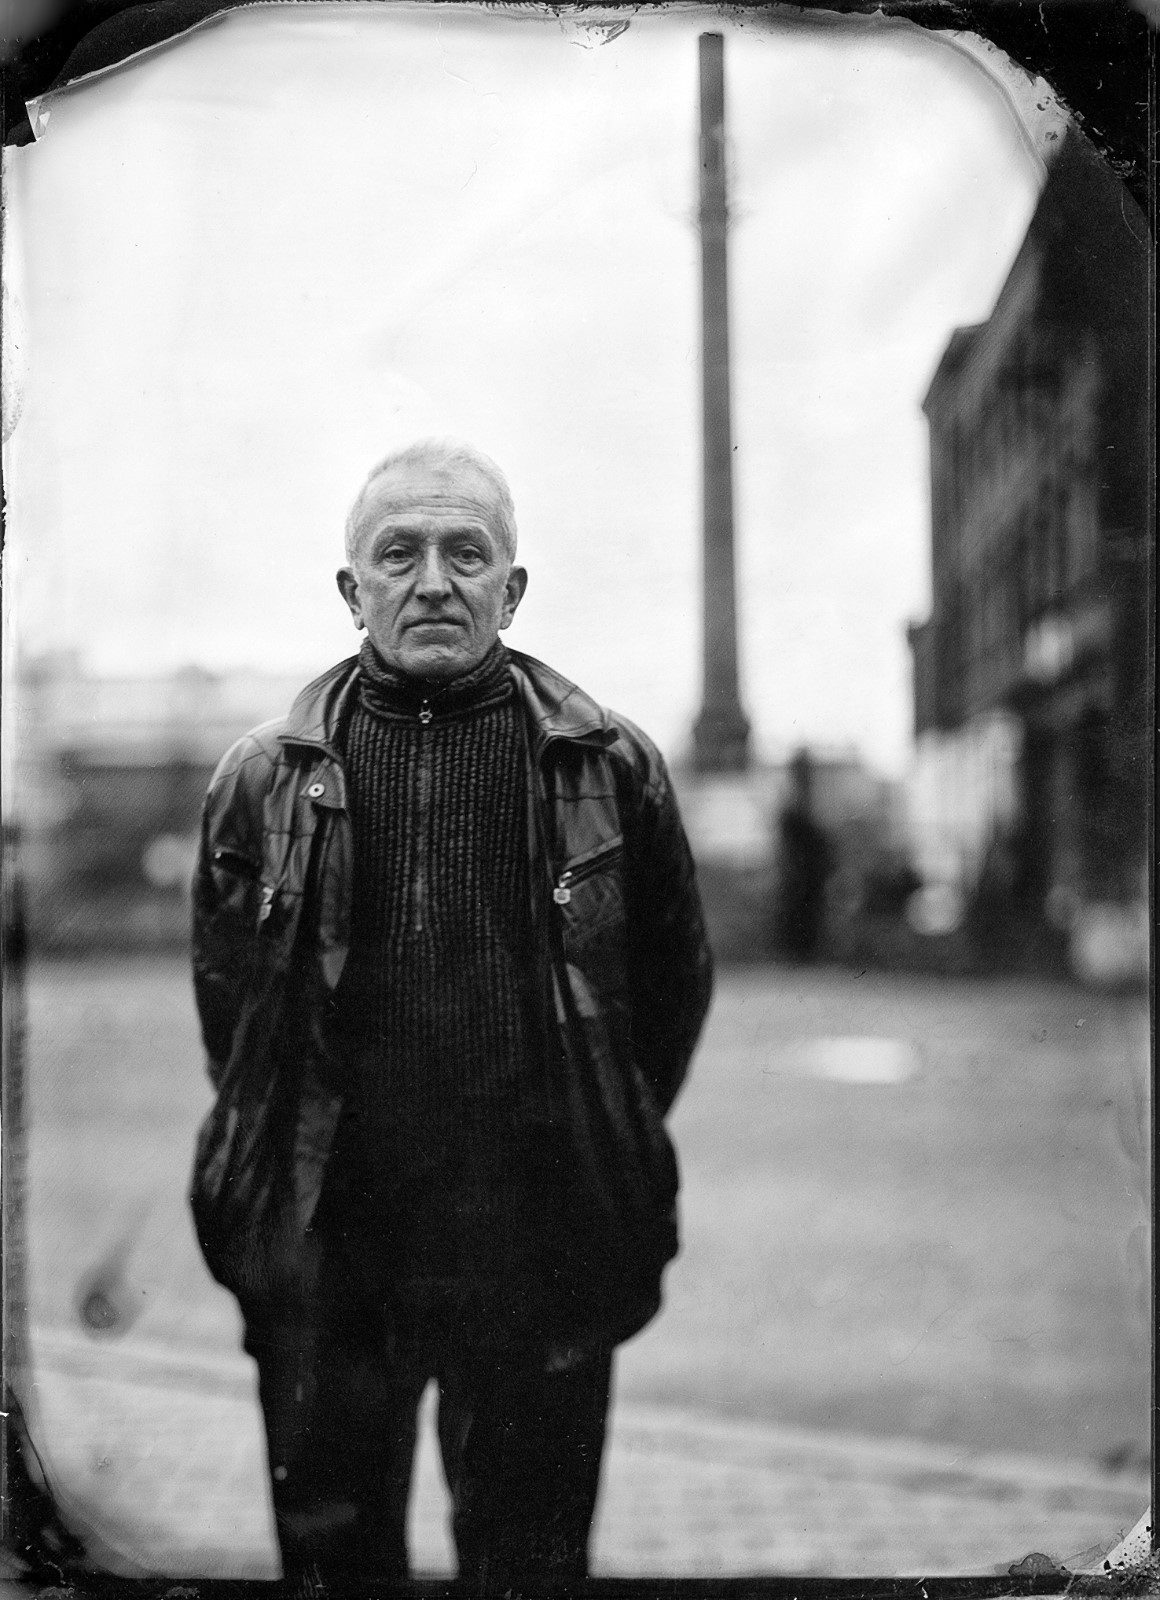 Portret Dolnego Śląska - Ambrotypia - Street Collodion Art